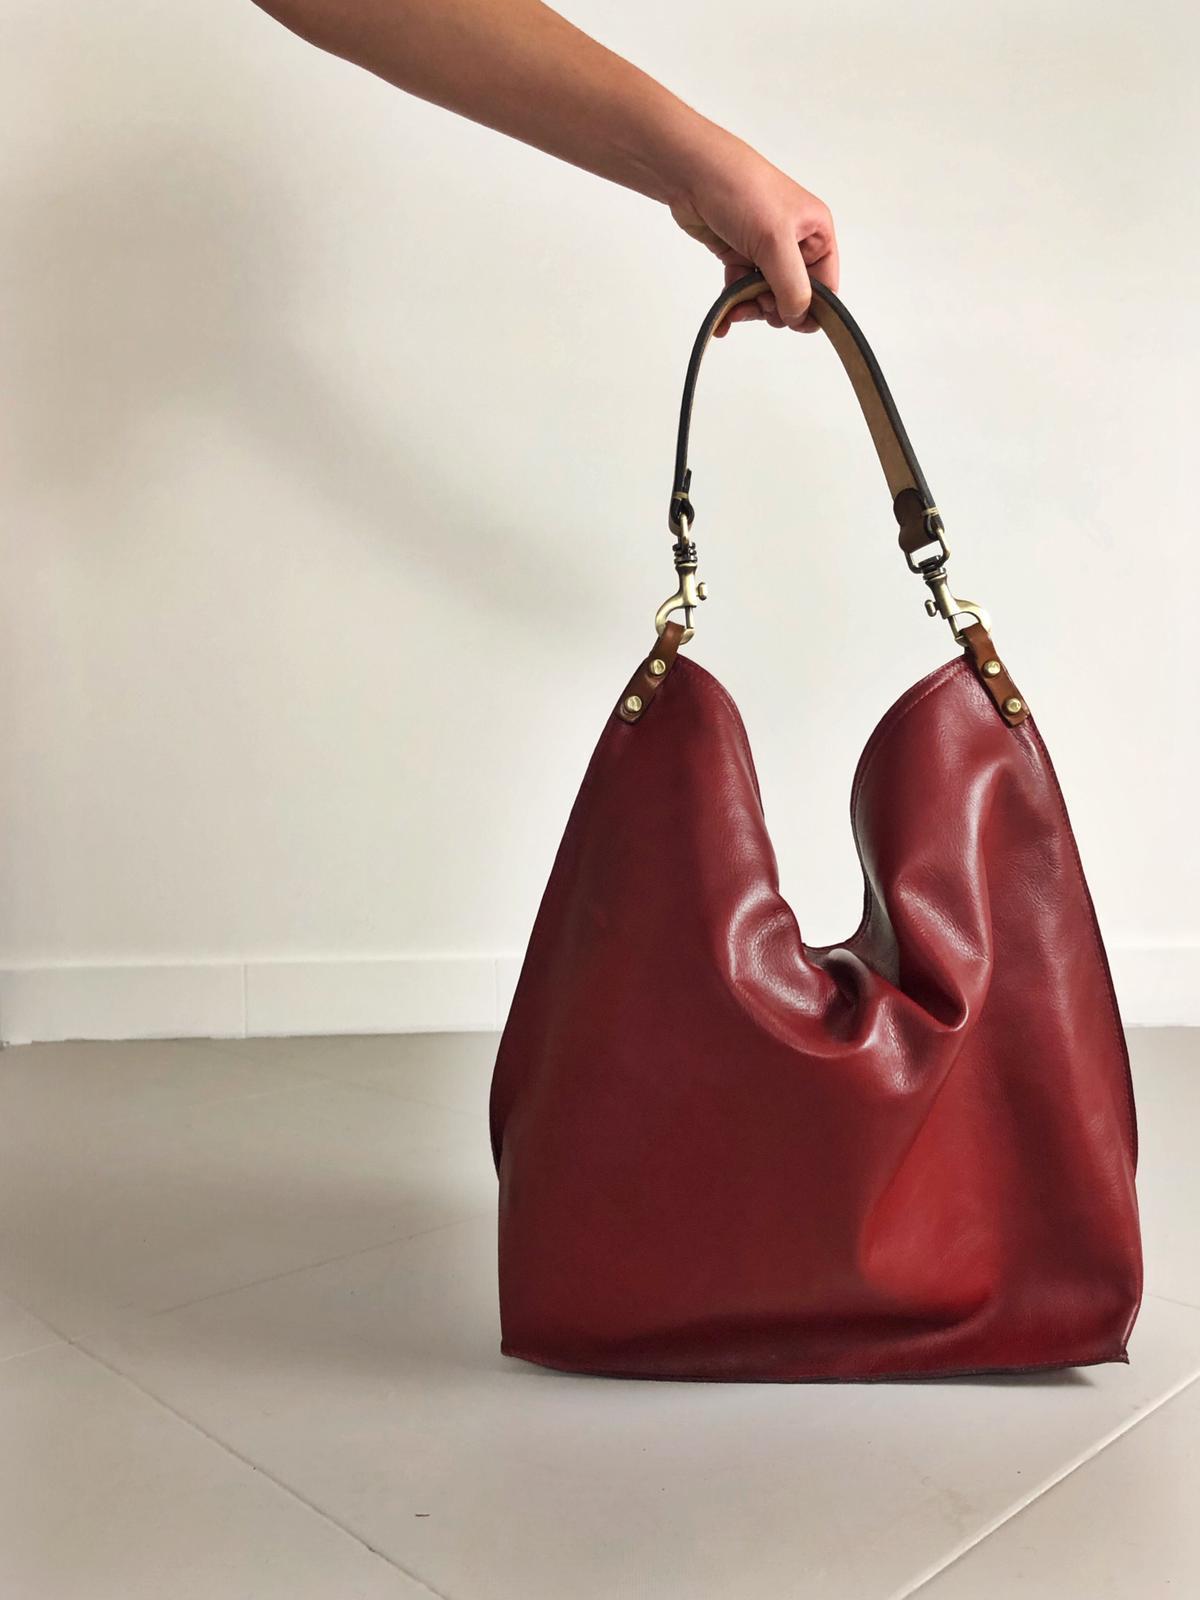 ALLEGRA BAG handmade leather bag